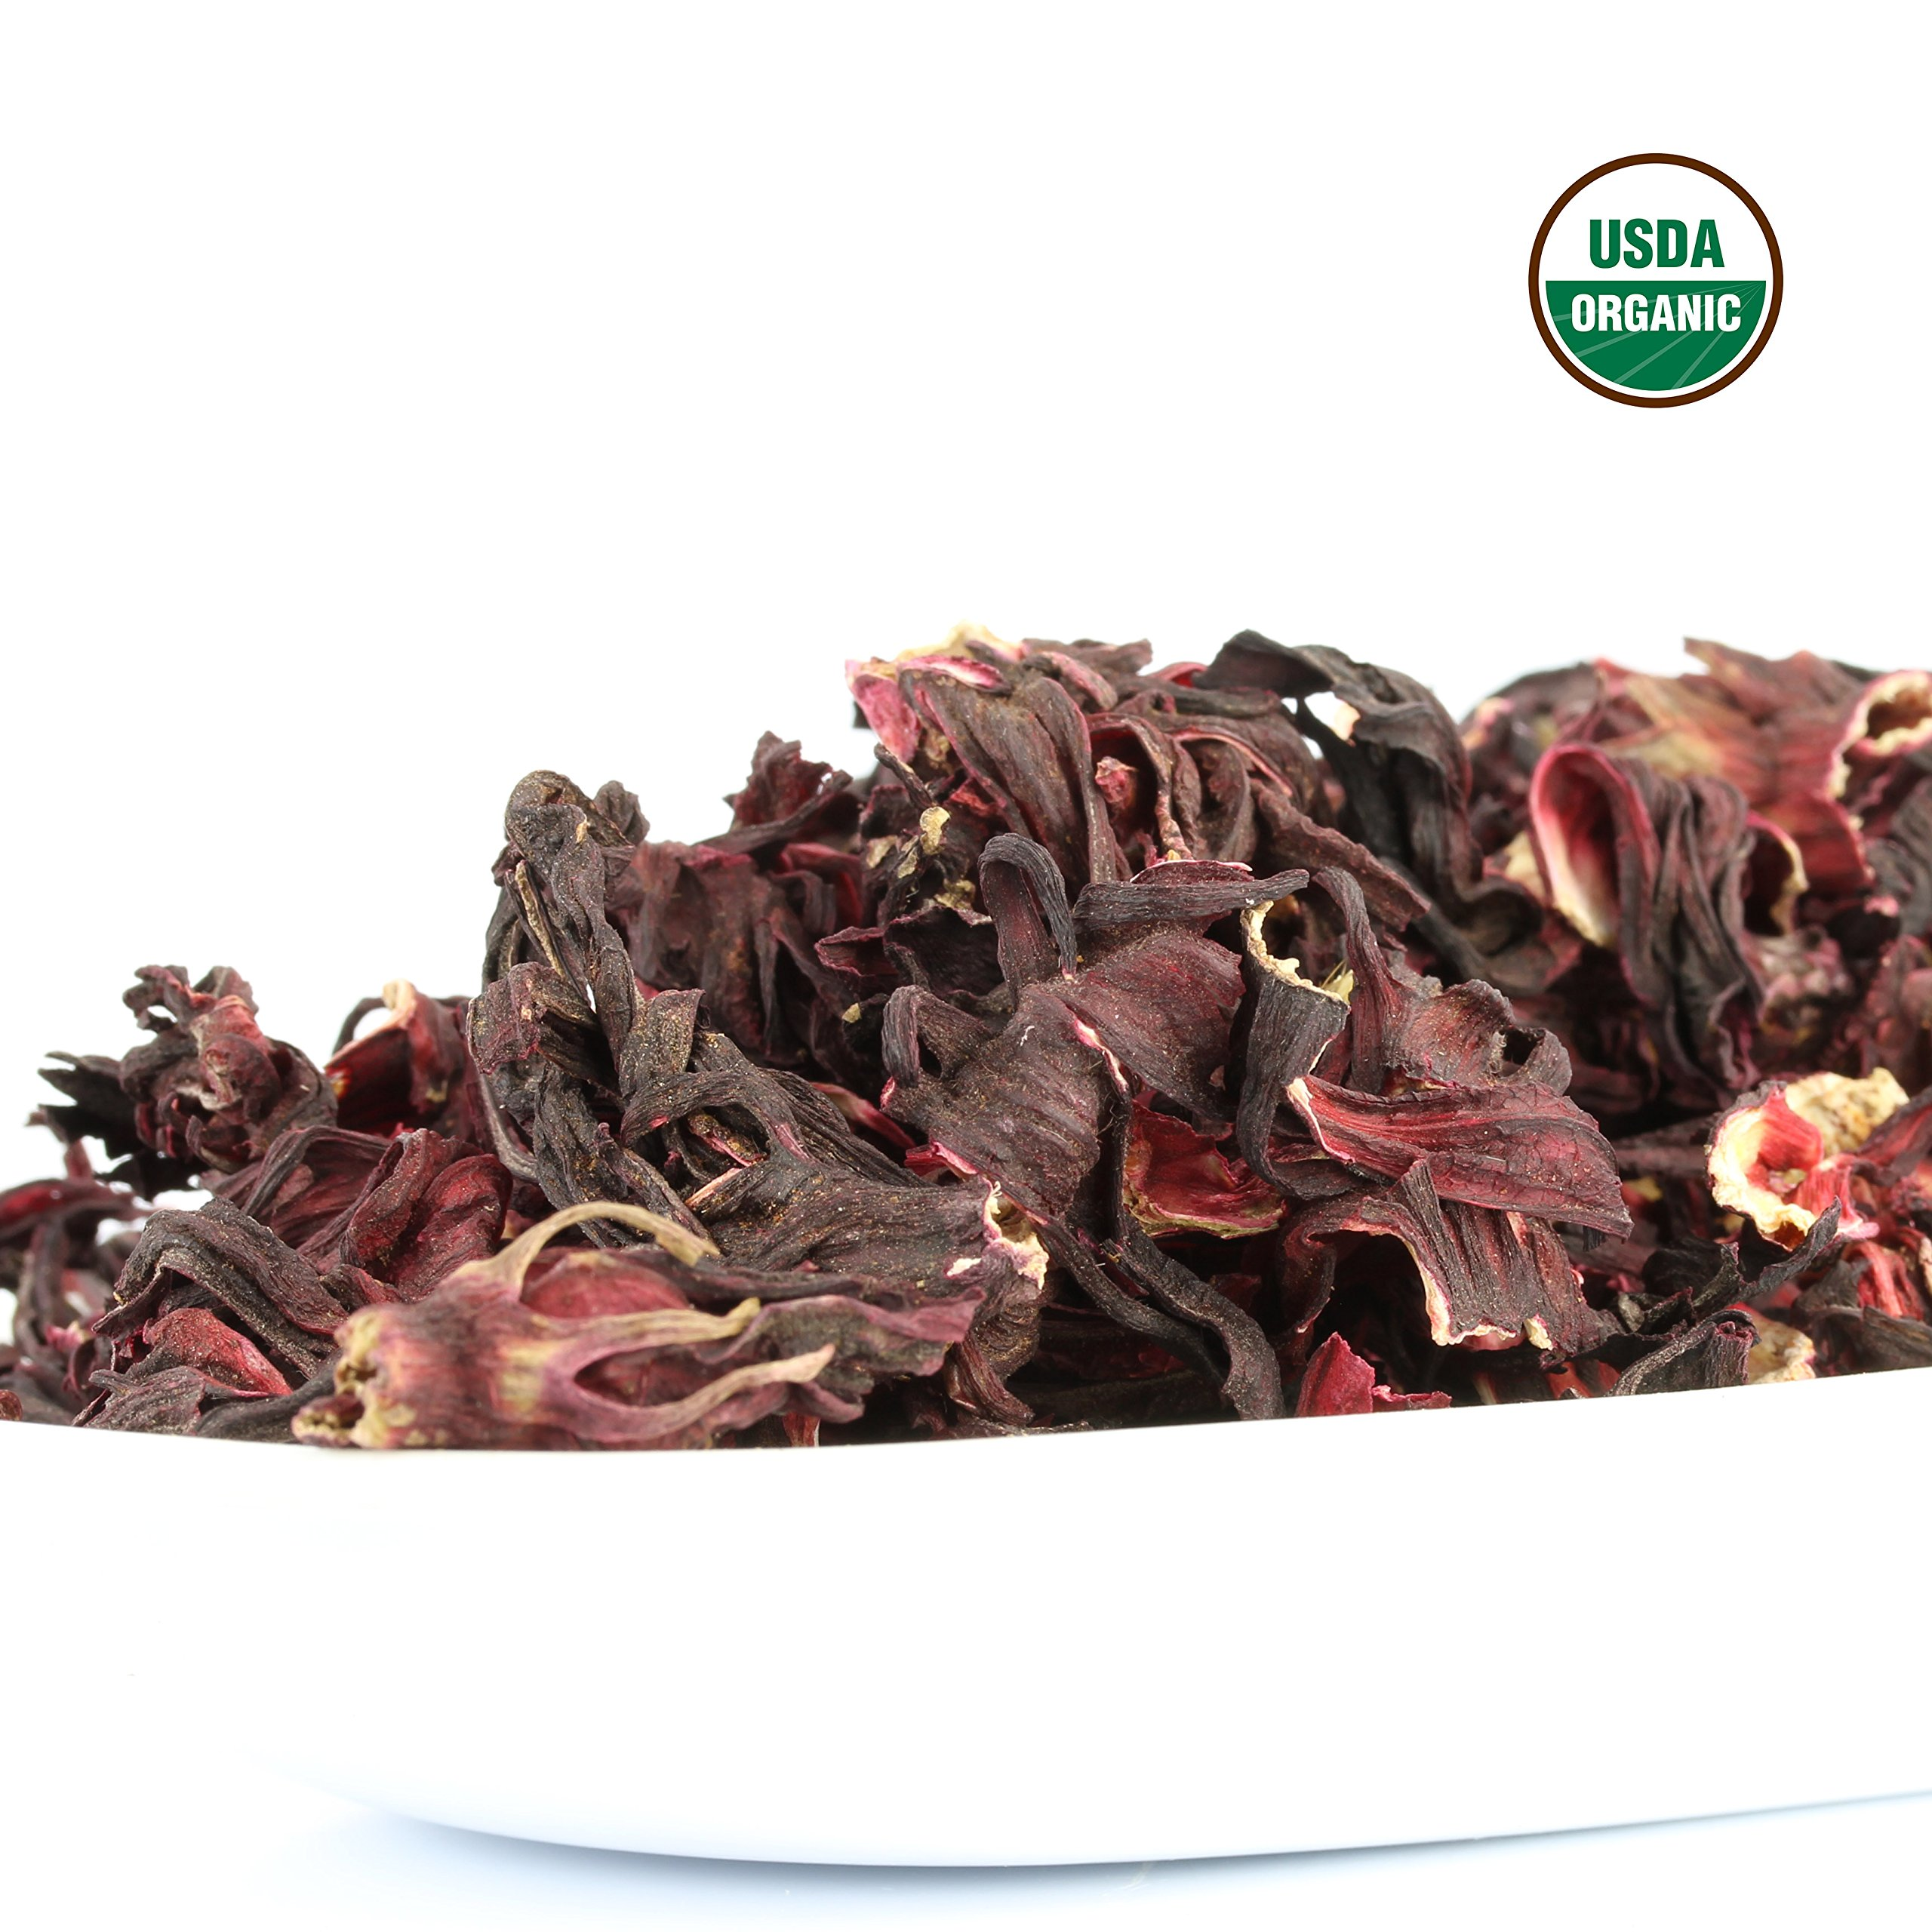 Hibiscus Tea 1LB (16Oz) 100% CERTIFIED Organic Hibiscus Flowers Herbal Tea (WHOLE PETALS), Caffeine Free in 1 lbs. Bulk Resealable Kraft BPA free Bags from U.S. Wellness by U.S. Wellness Naturals (Image #5)